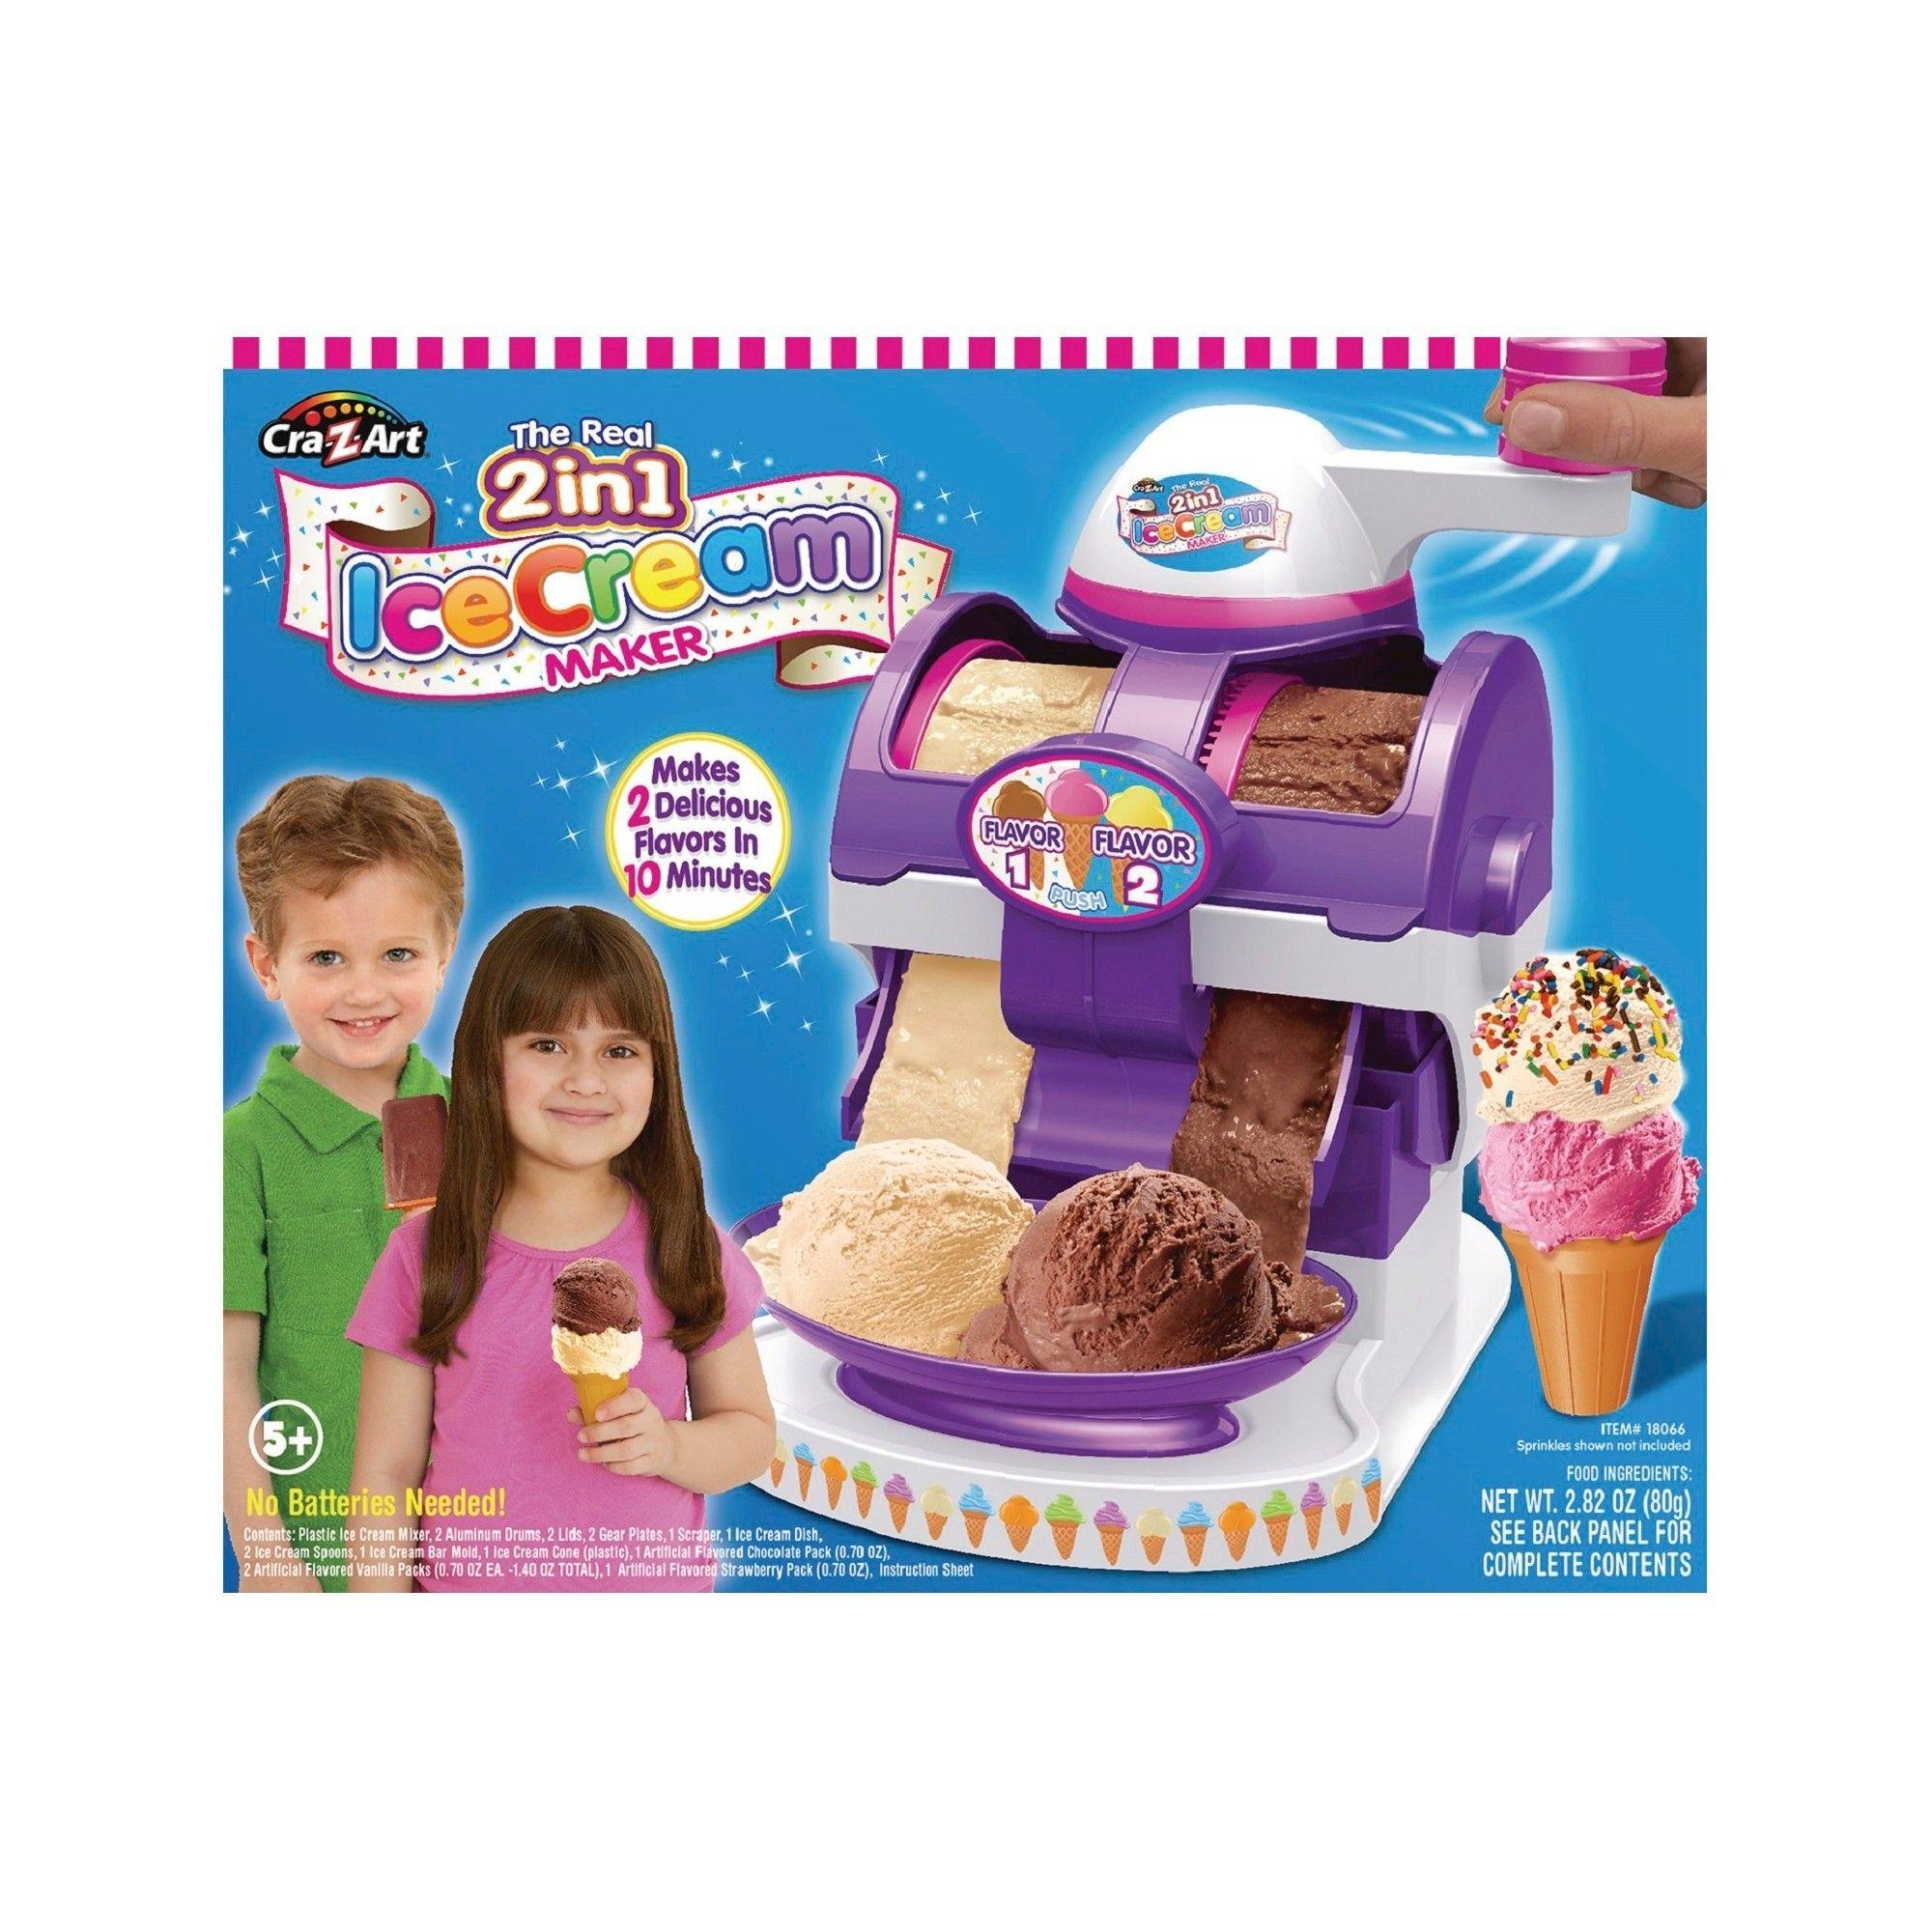 Cra-Z-Art The Real 2 in 1 Ice Cream Maker, | Kids ice ...